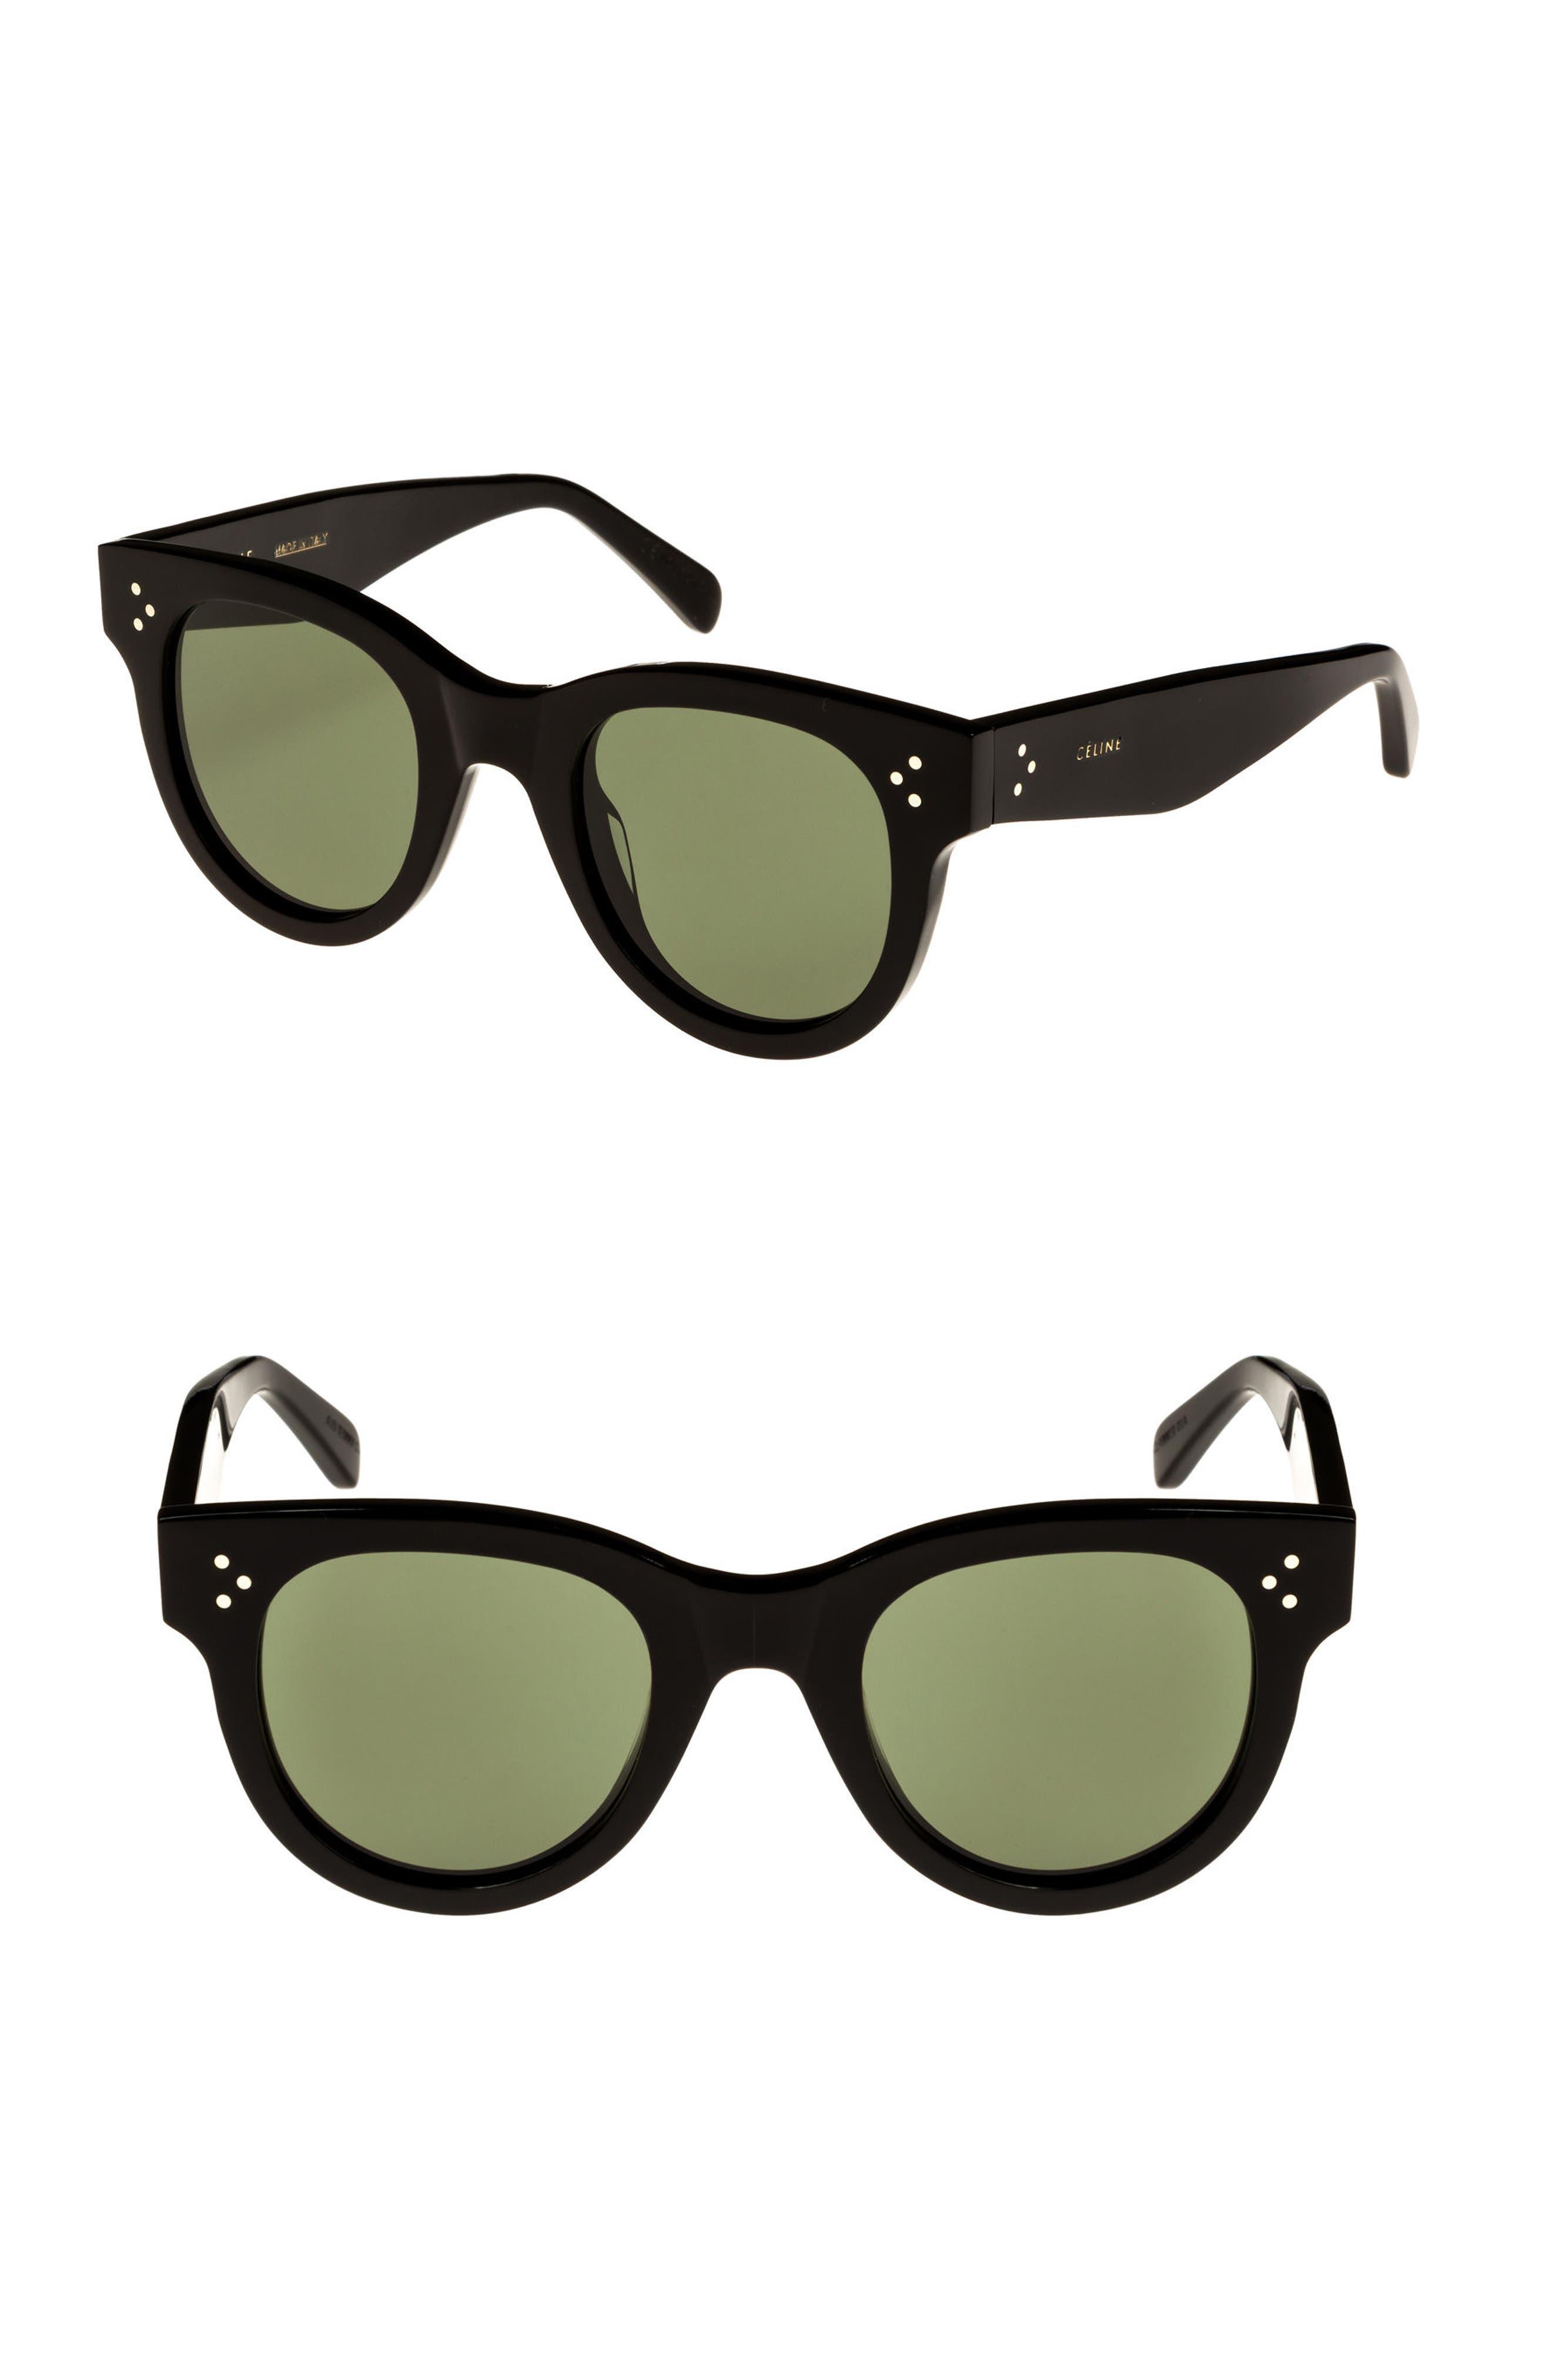 48mm Cat Eye Sunglasses,                         Main,                         color, Black/ Smoke Barberini